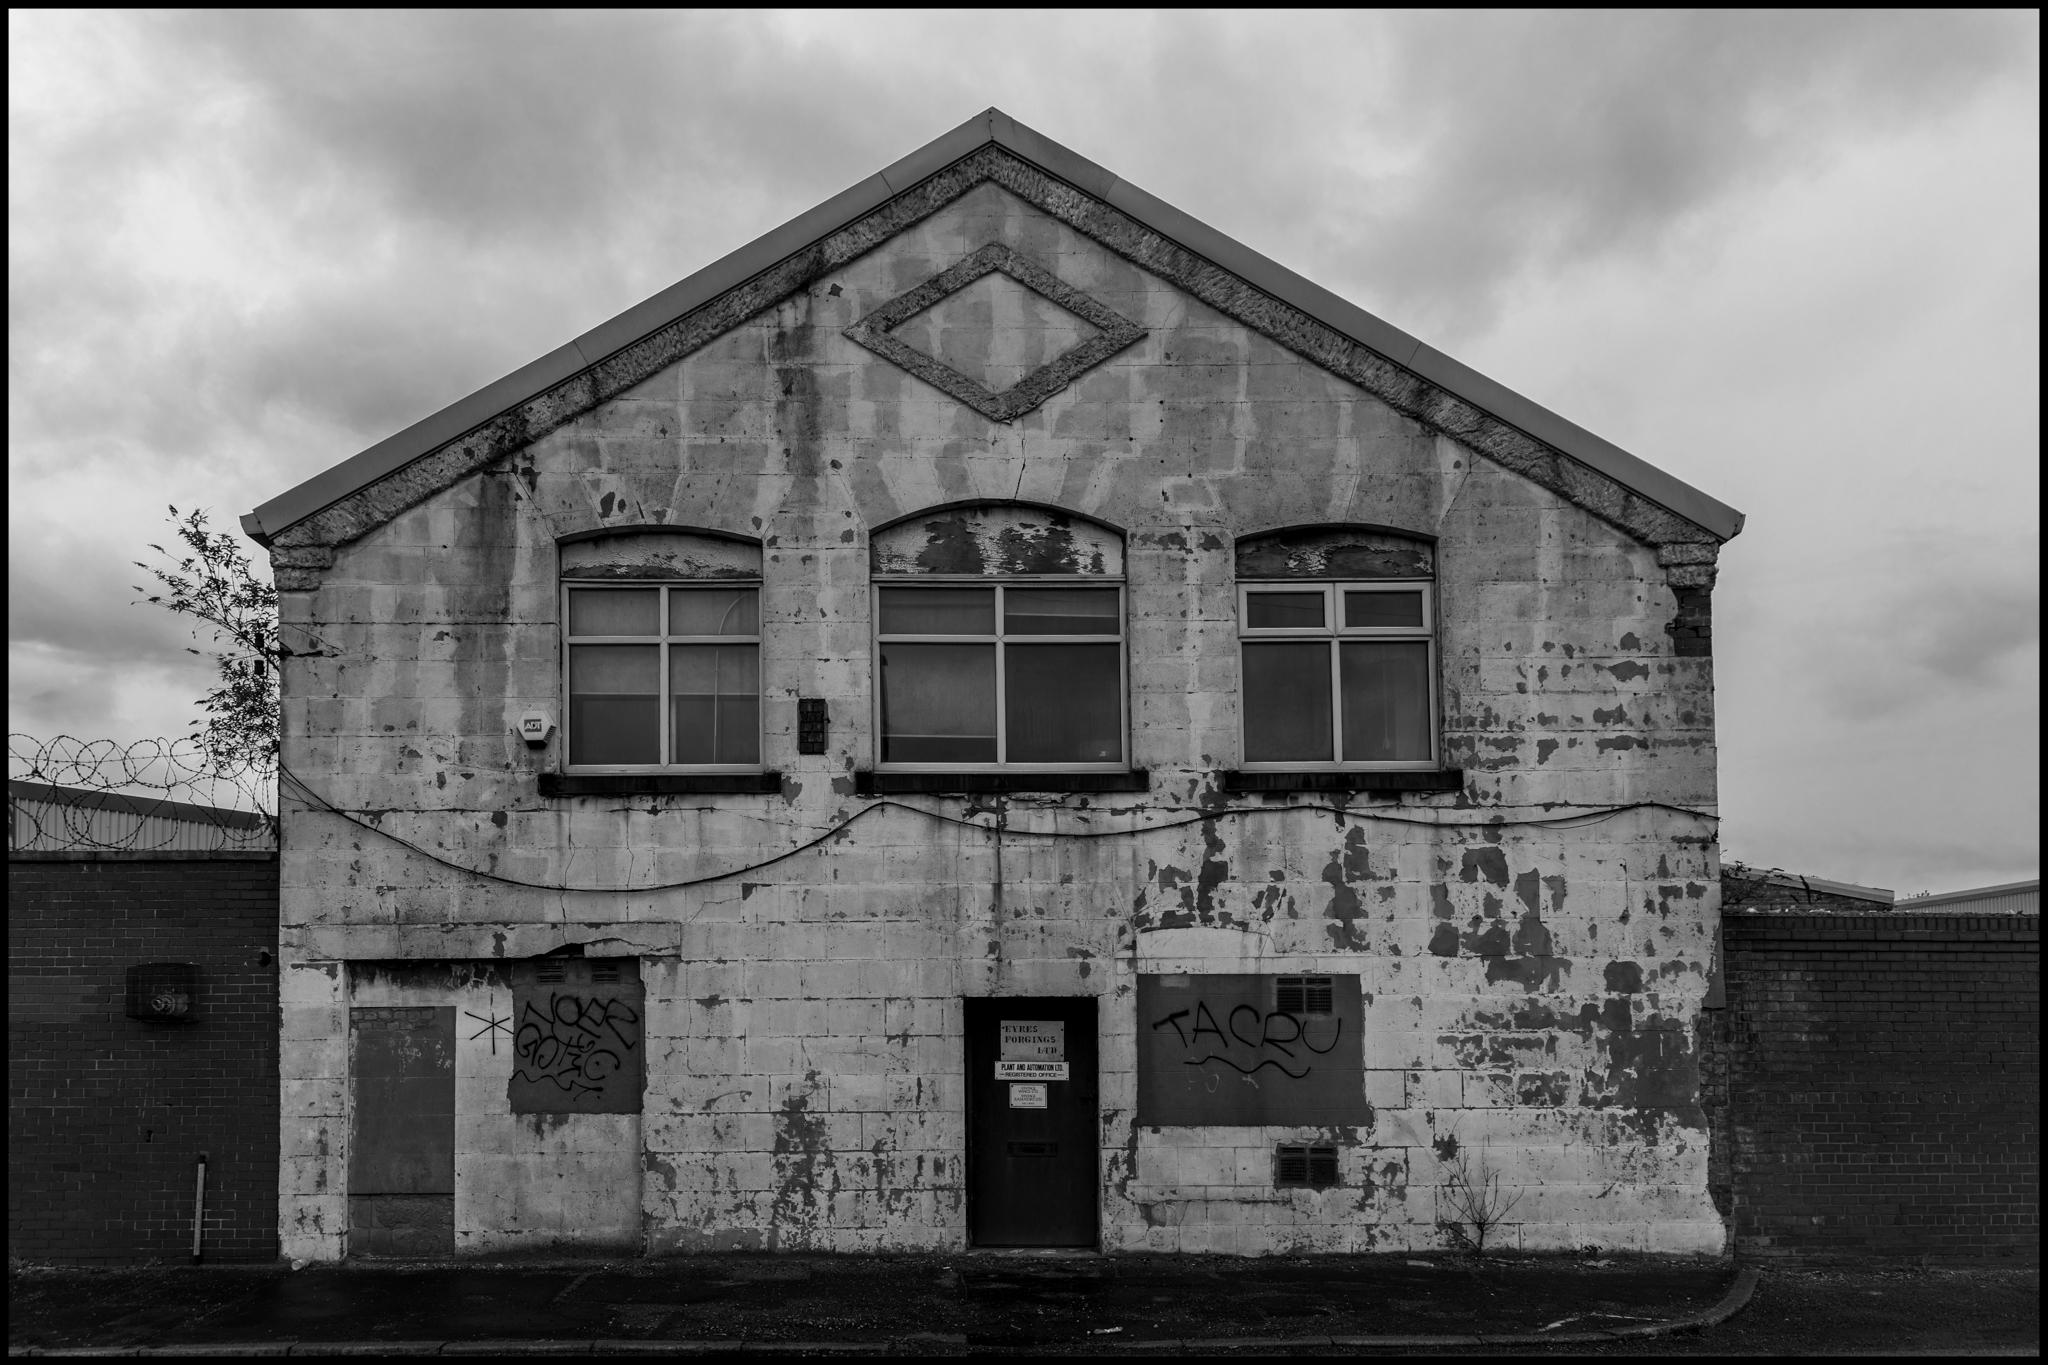 11 May 2019 - Factory #2, Manchester UK